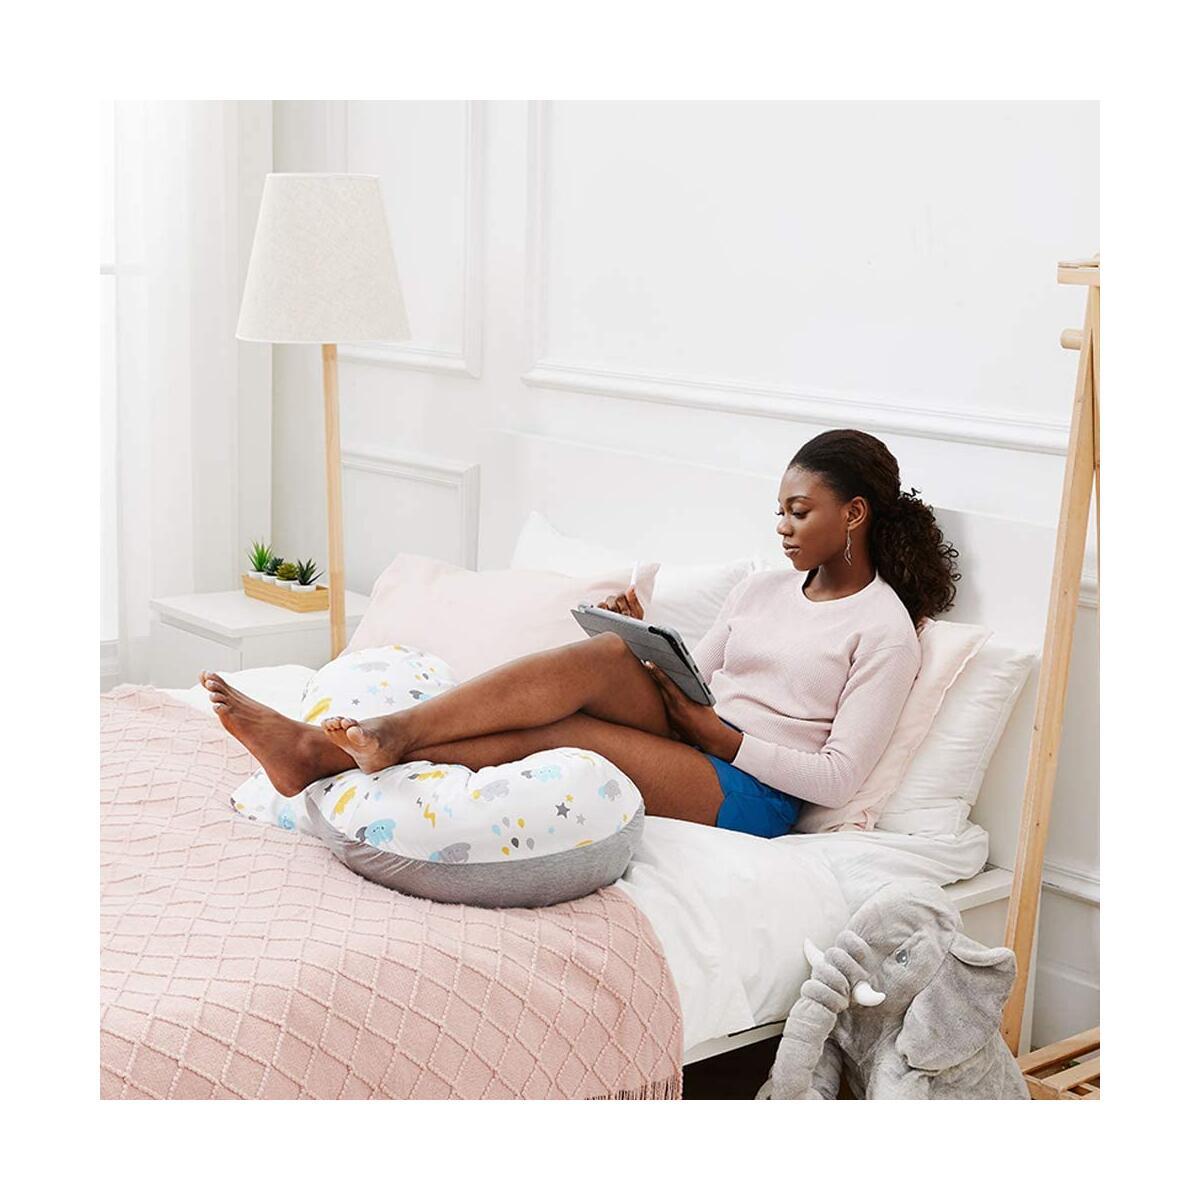 Unilove Hopo 3-In-1 Pregnancy Pillow, Breastfeeding Support & Newborn Lounger, Sky Gray